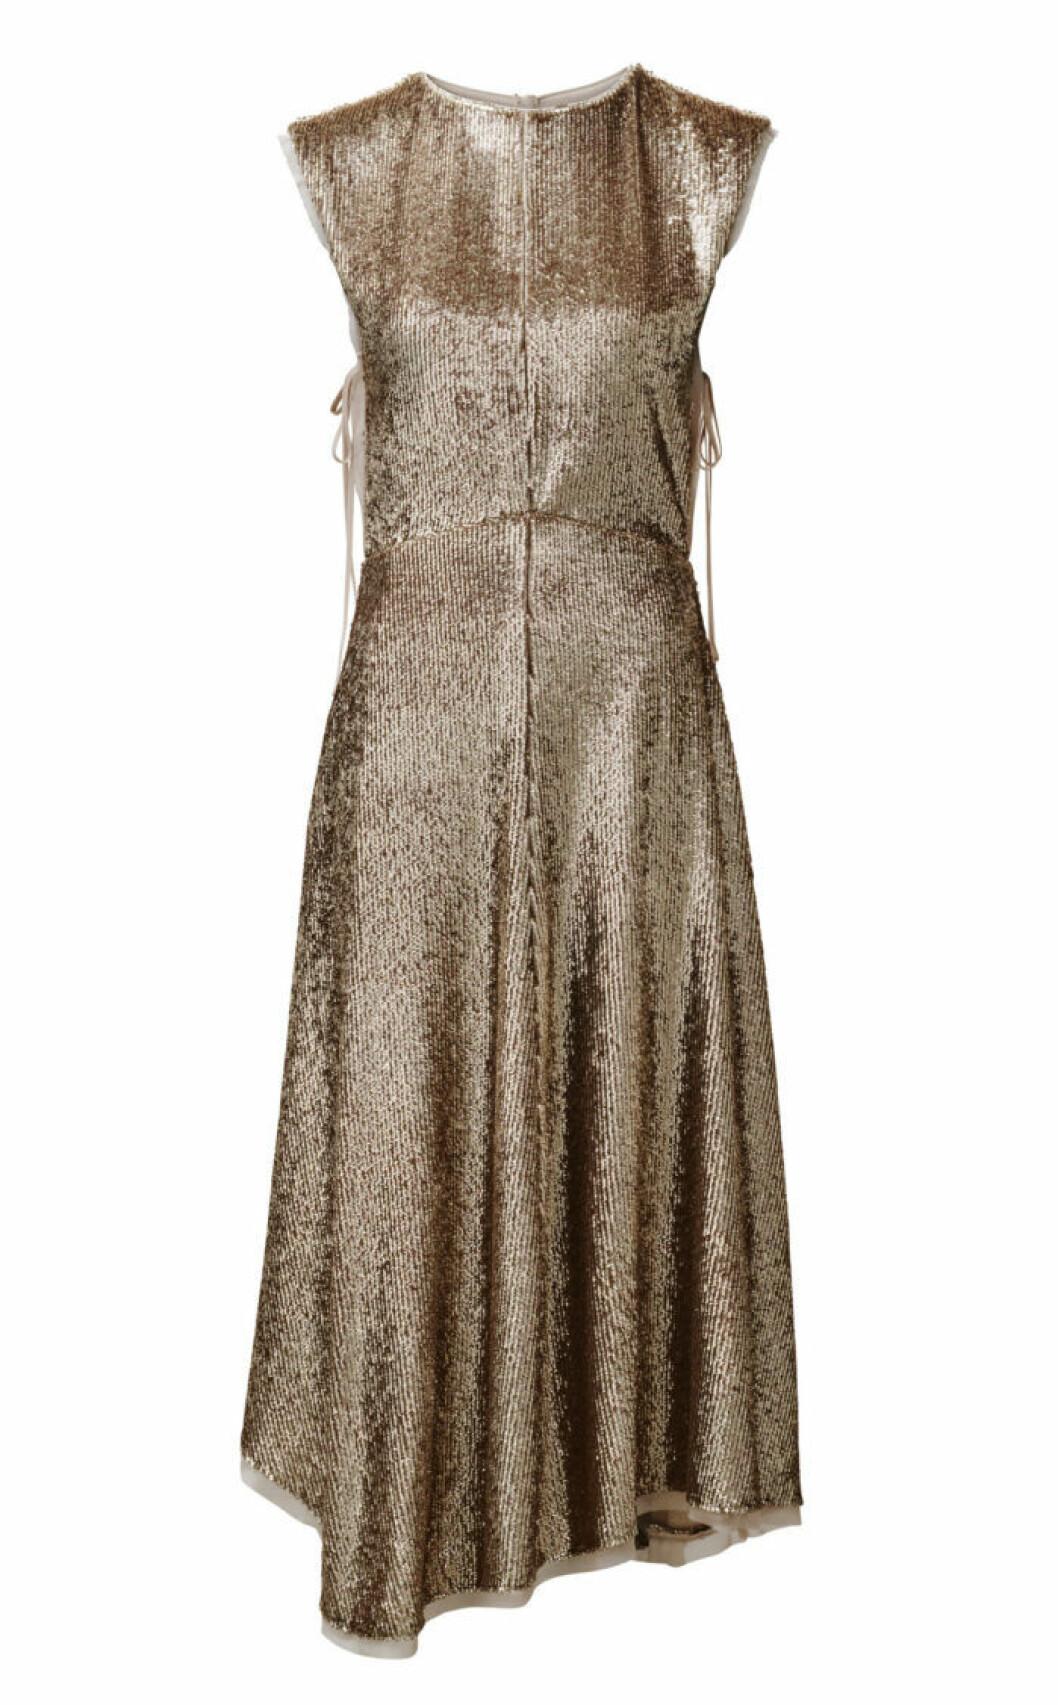 H&M Conscious Exclusive 2019 guldfärgad klänning